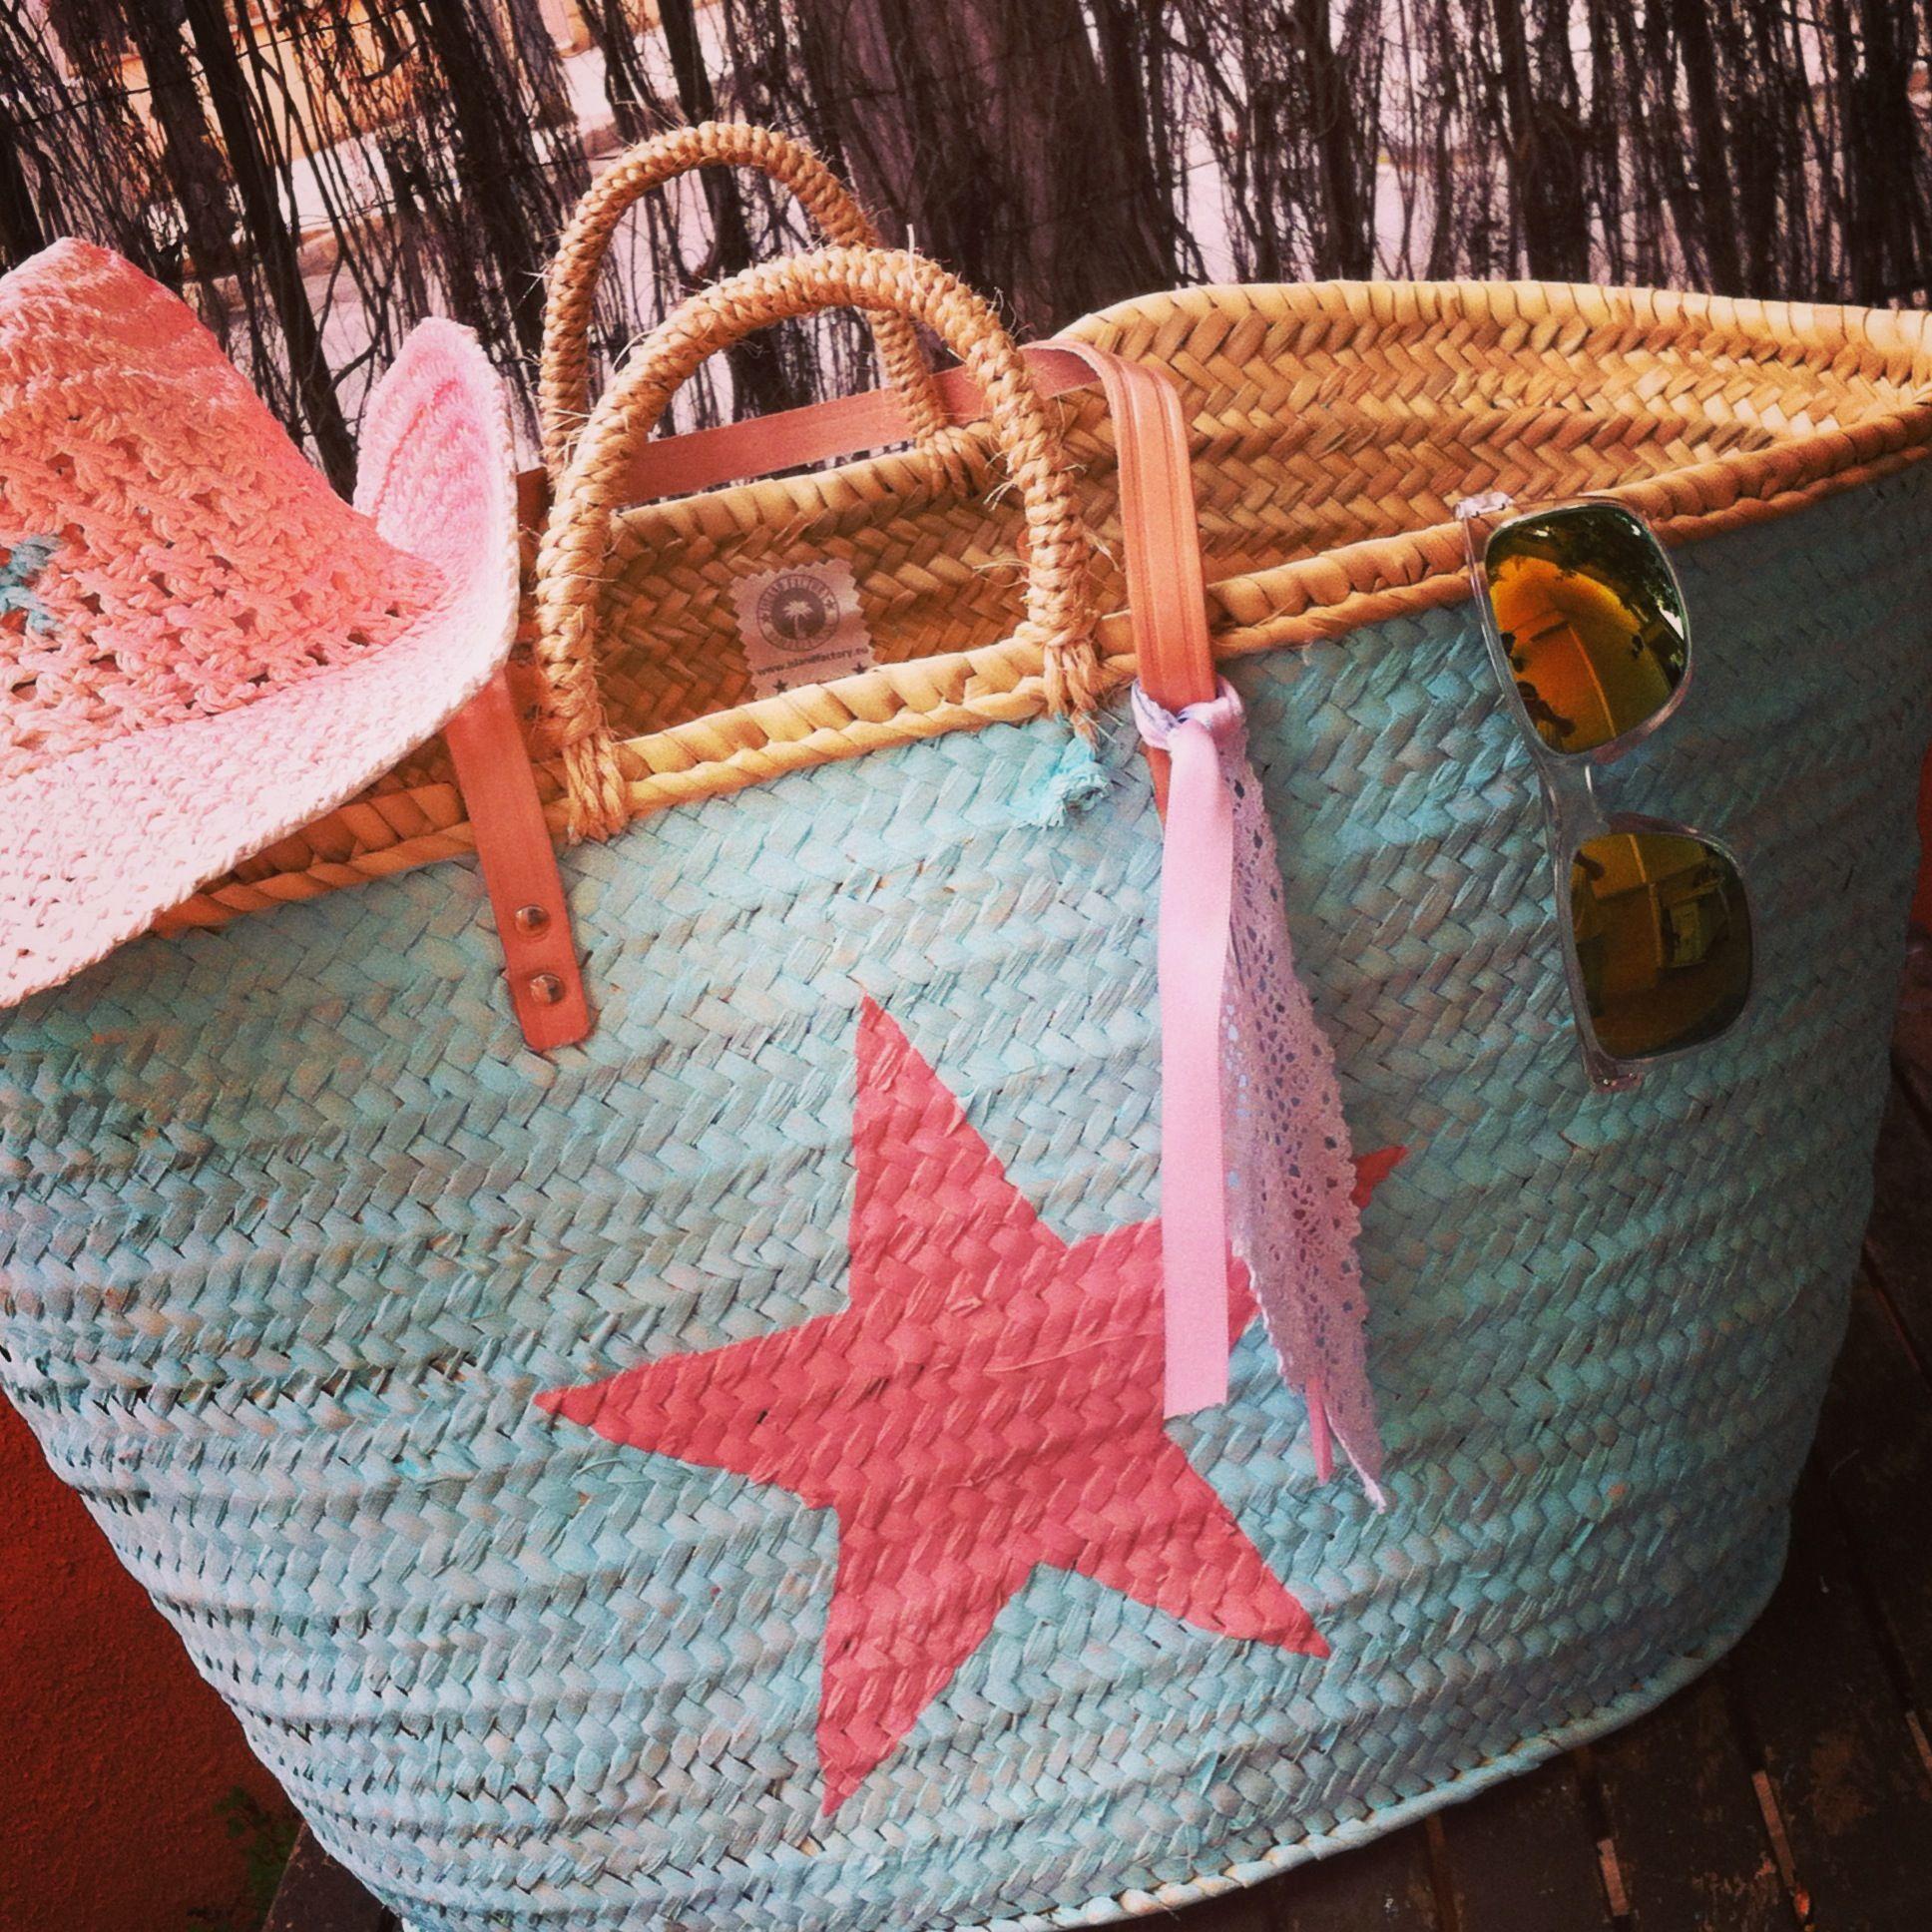 capazos pintados strandtasche capazo pinterest bag custom bags and. Black Bedroom Furniture Sets. Home Design Ideas